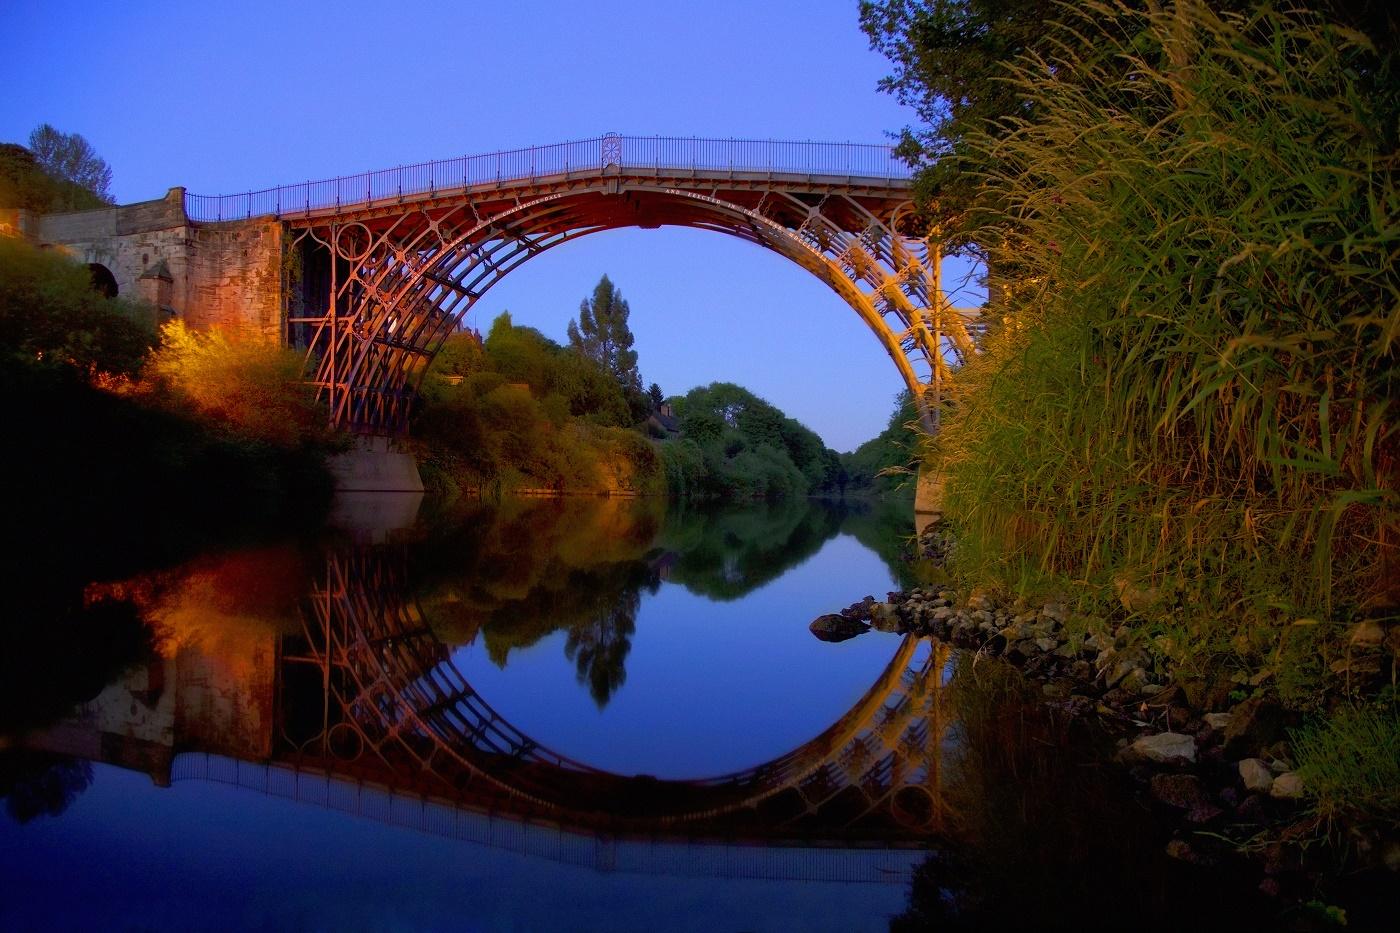 0 151c7d f38af5a9 orig - Таттон парк и его Обезьяний мост